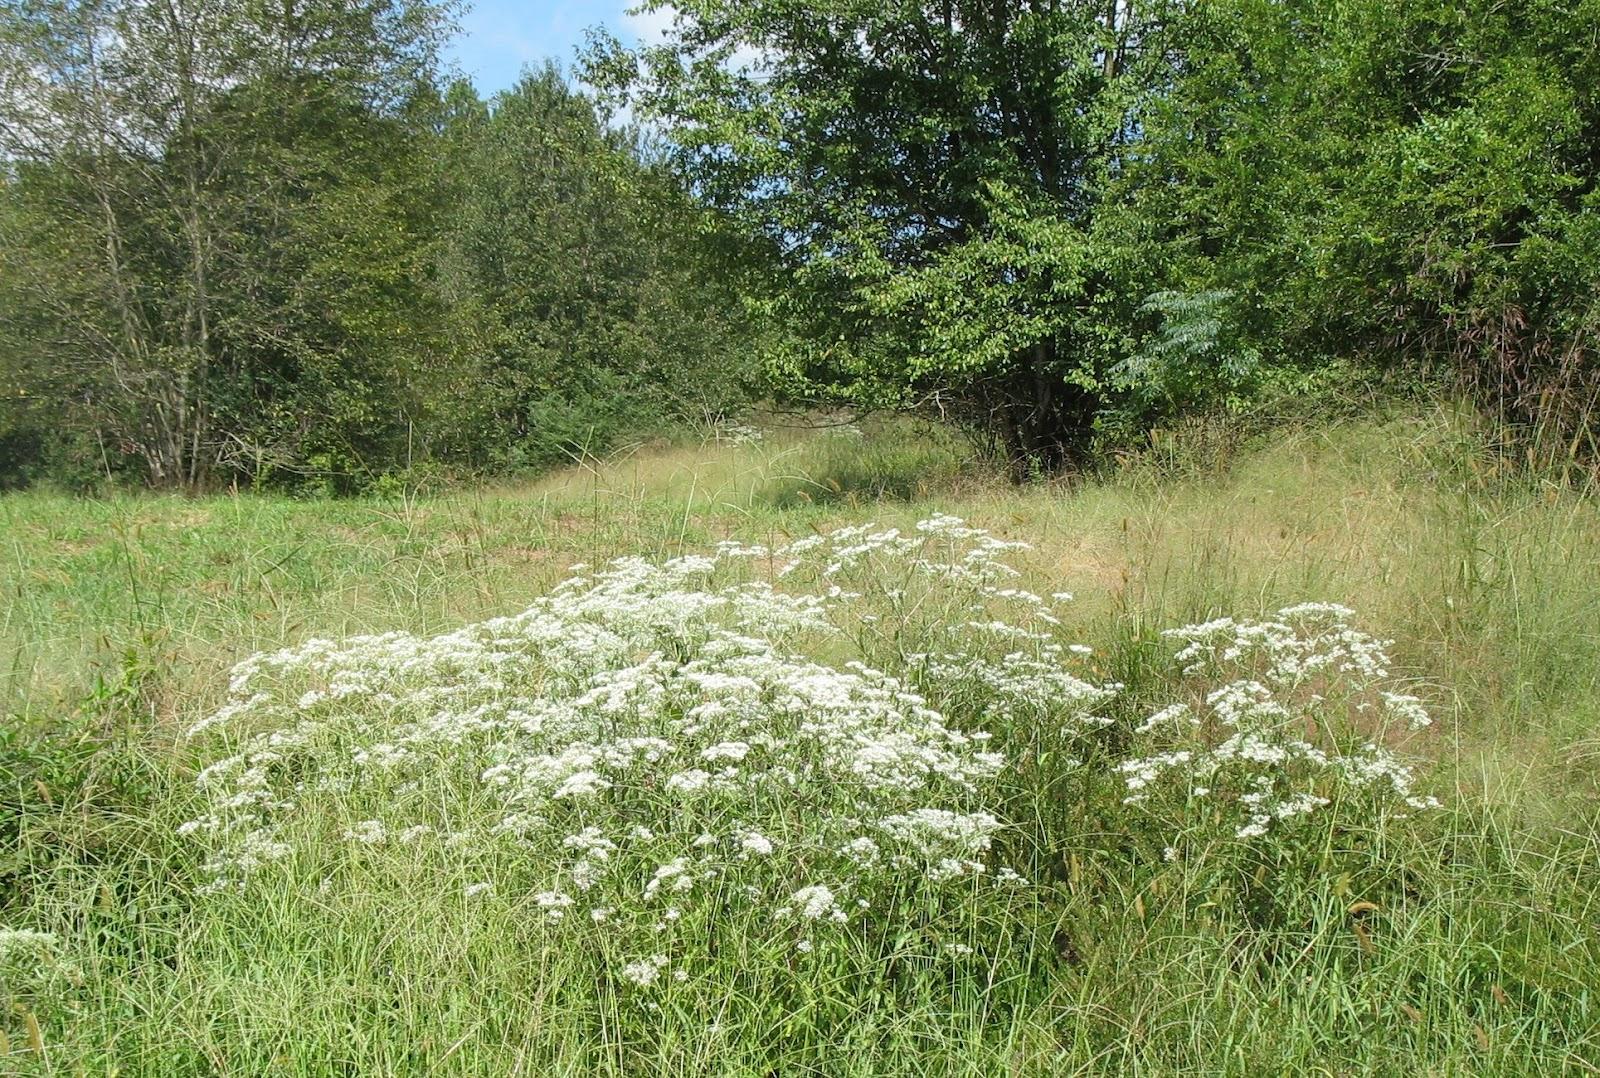 Using georgia native plants wild roadside vs average garden for Wild grass landscaping